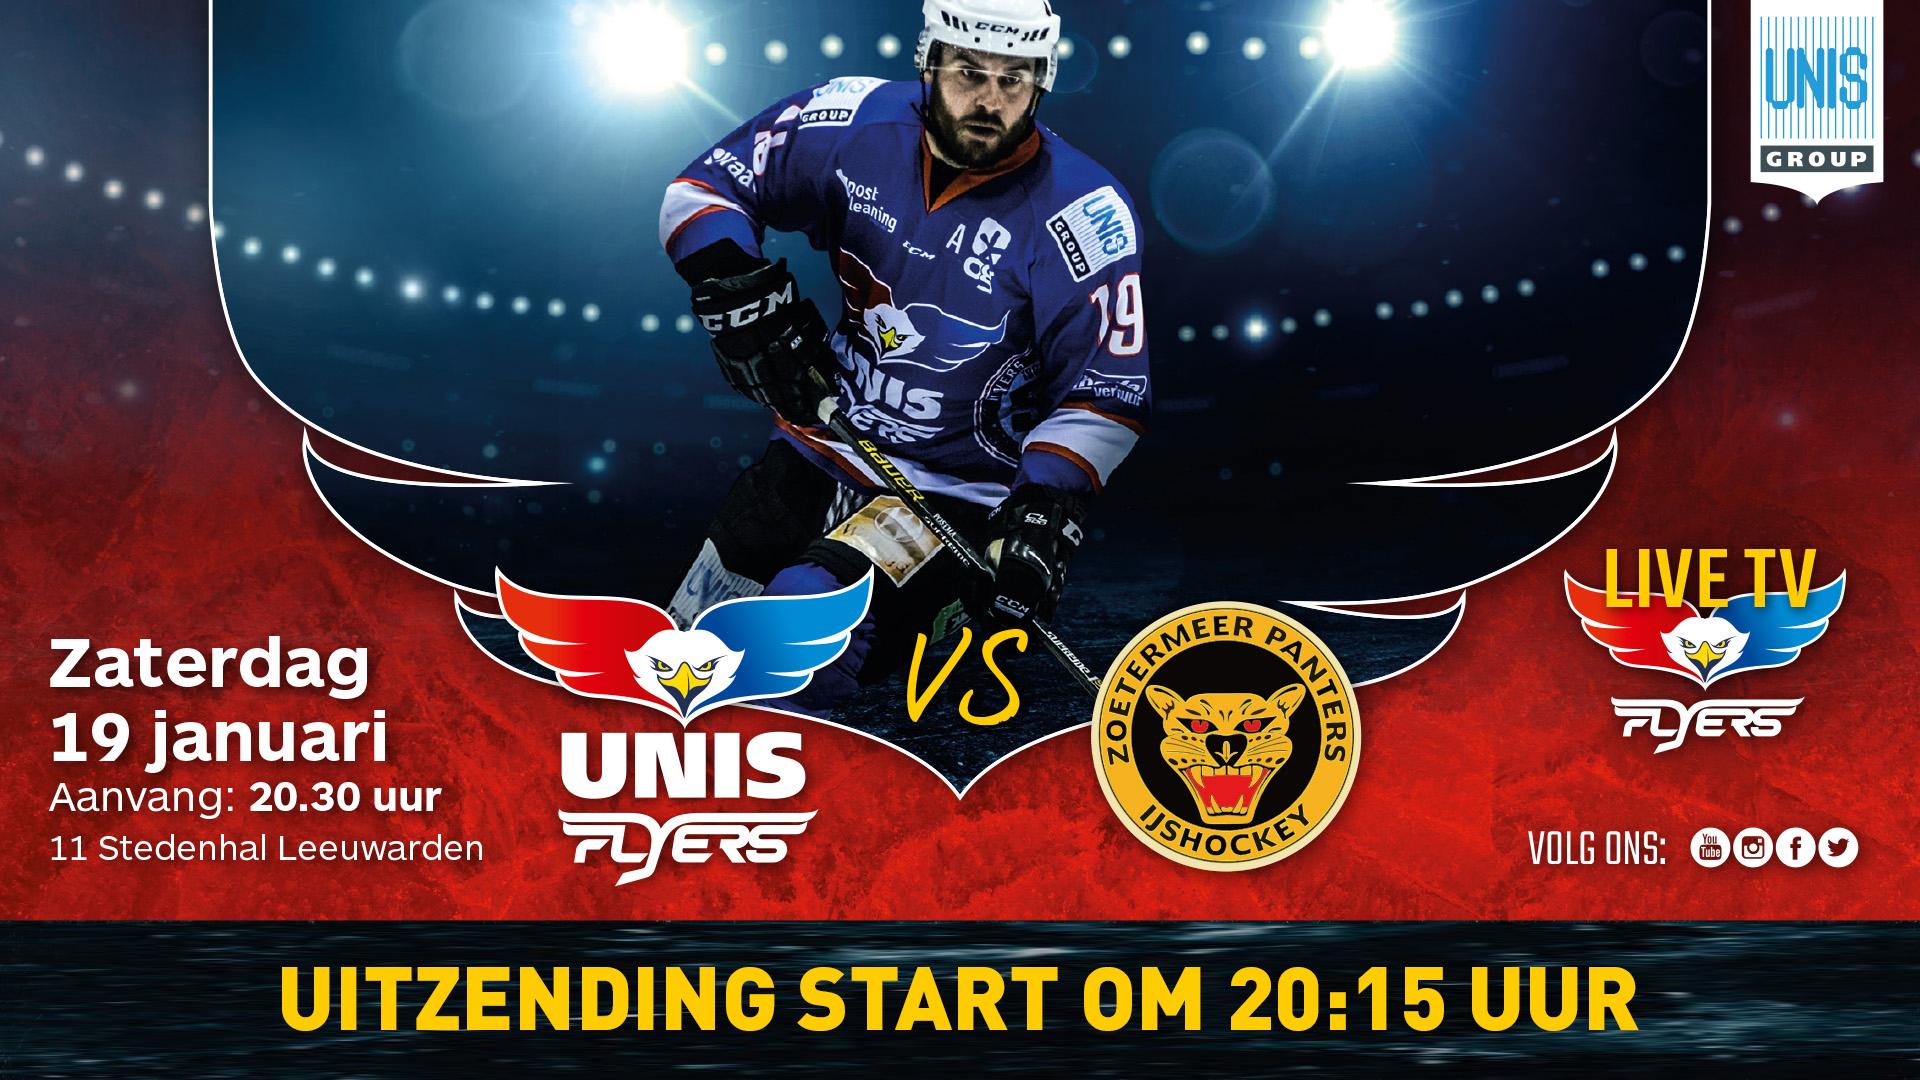 ivestream IJshockey Unis Flyers vs. Zoetermeer Panters 12 januari 2019 20:15 uur